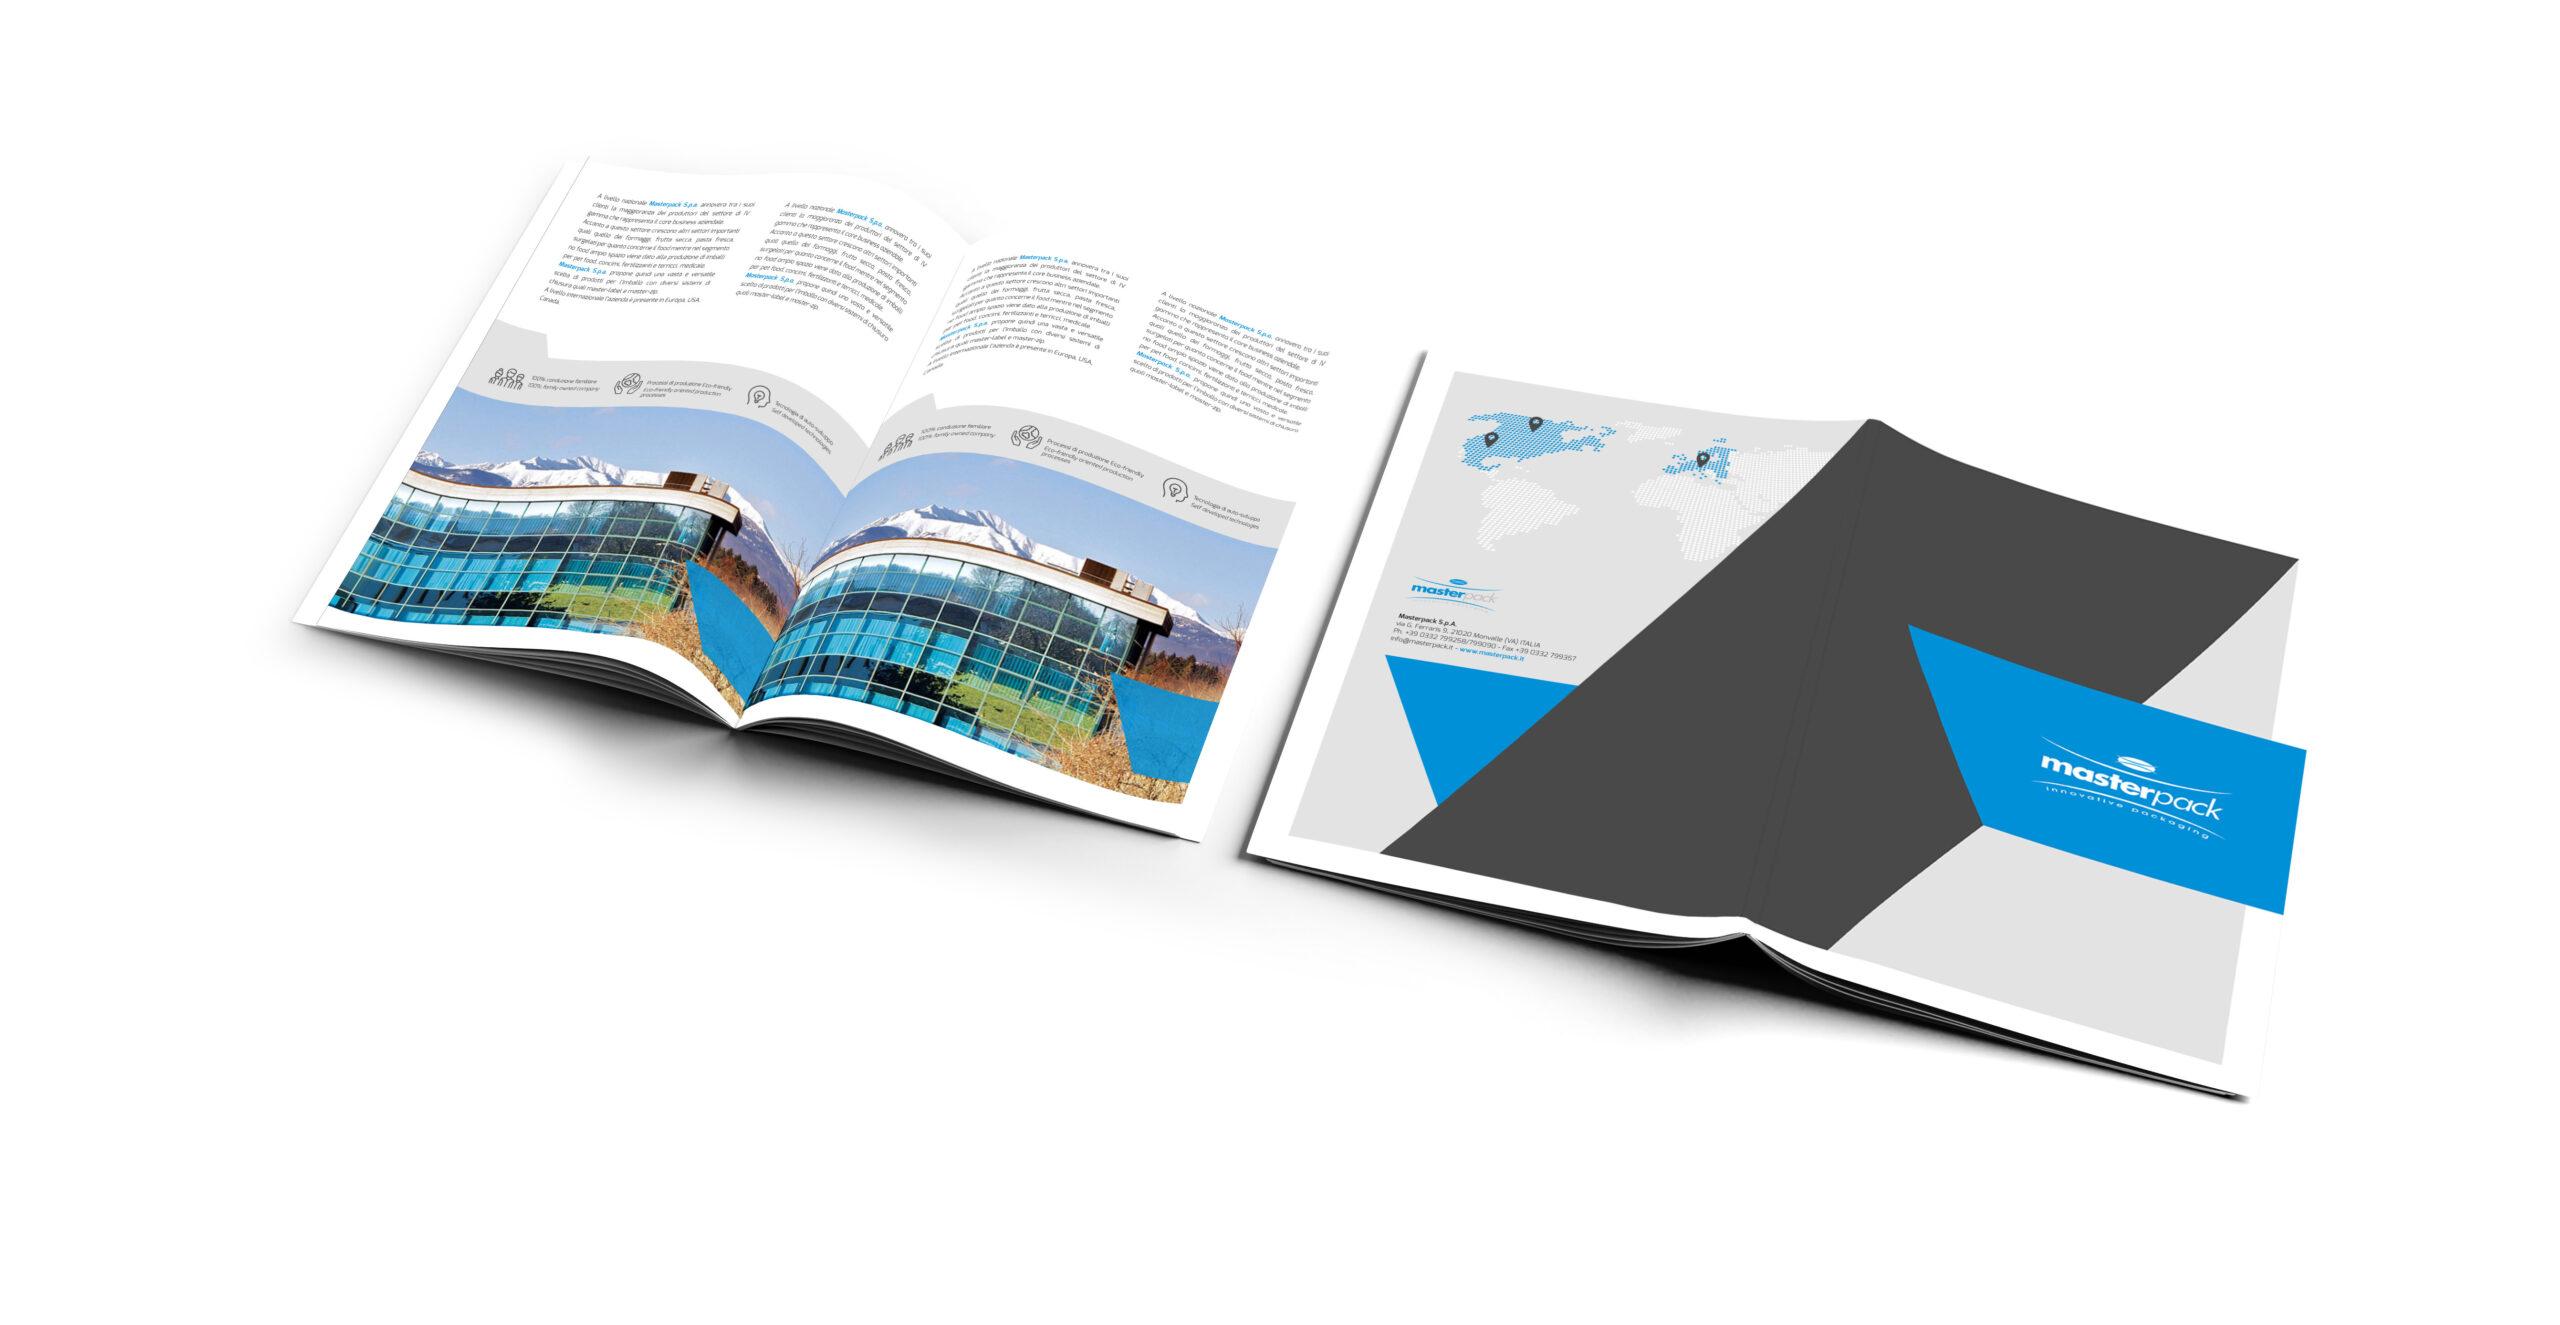 KFDS - Masterpack Case Study Company Profile